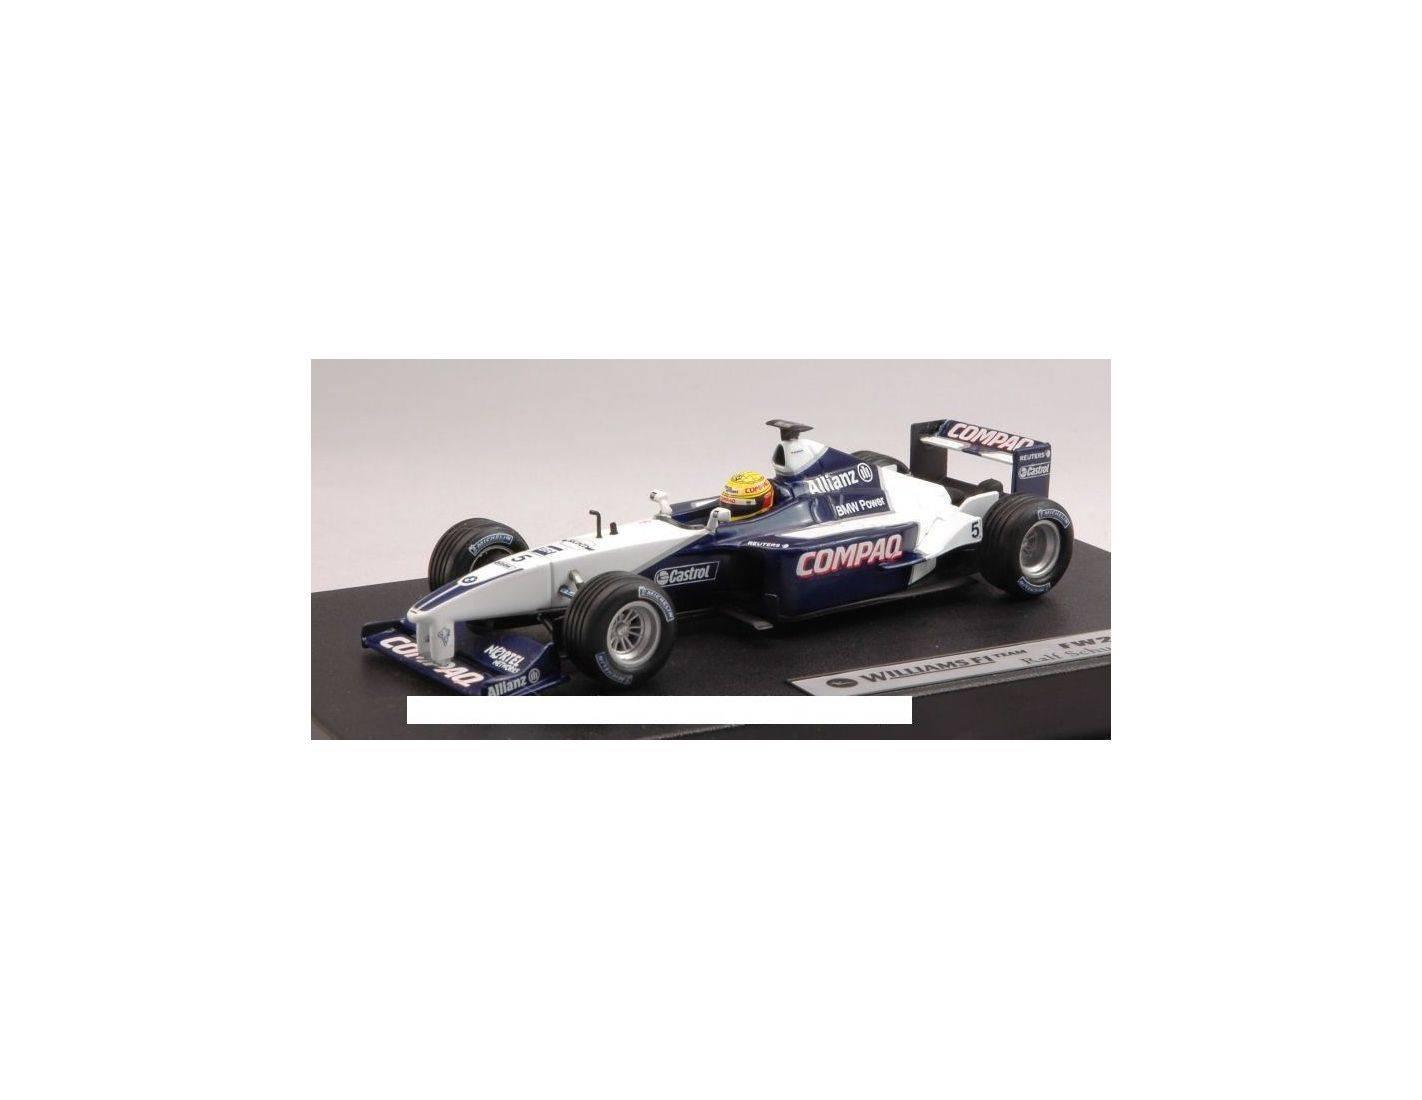 Hot Wheels Hw50211 Williams Fw23 N5 Ralf Schumacher 2001 143 Modellino Hotwheels Elite Ferrari Fxx Michael